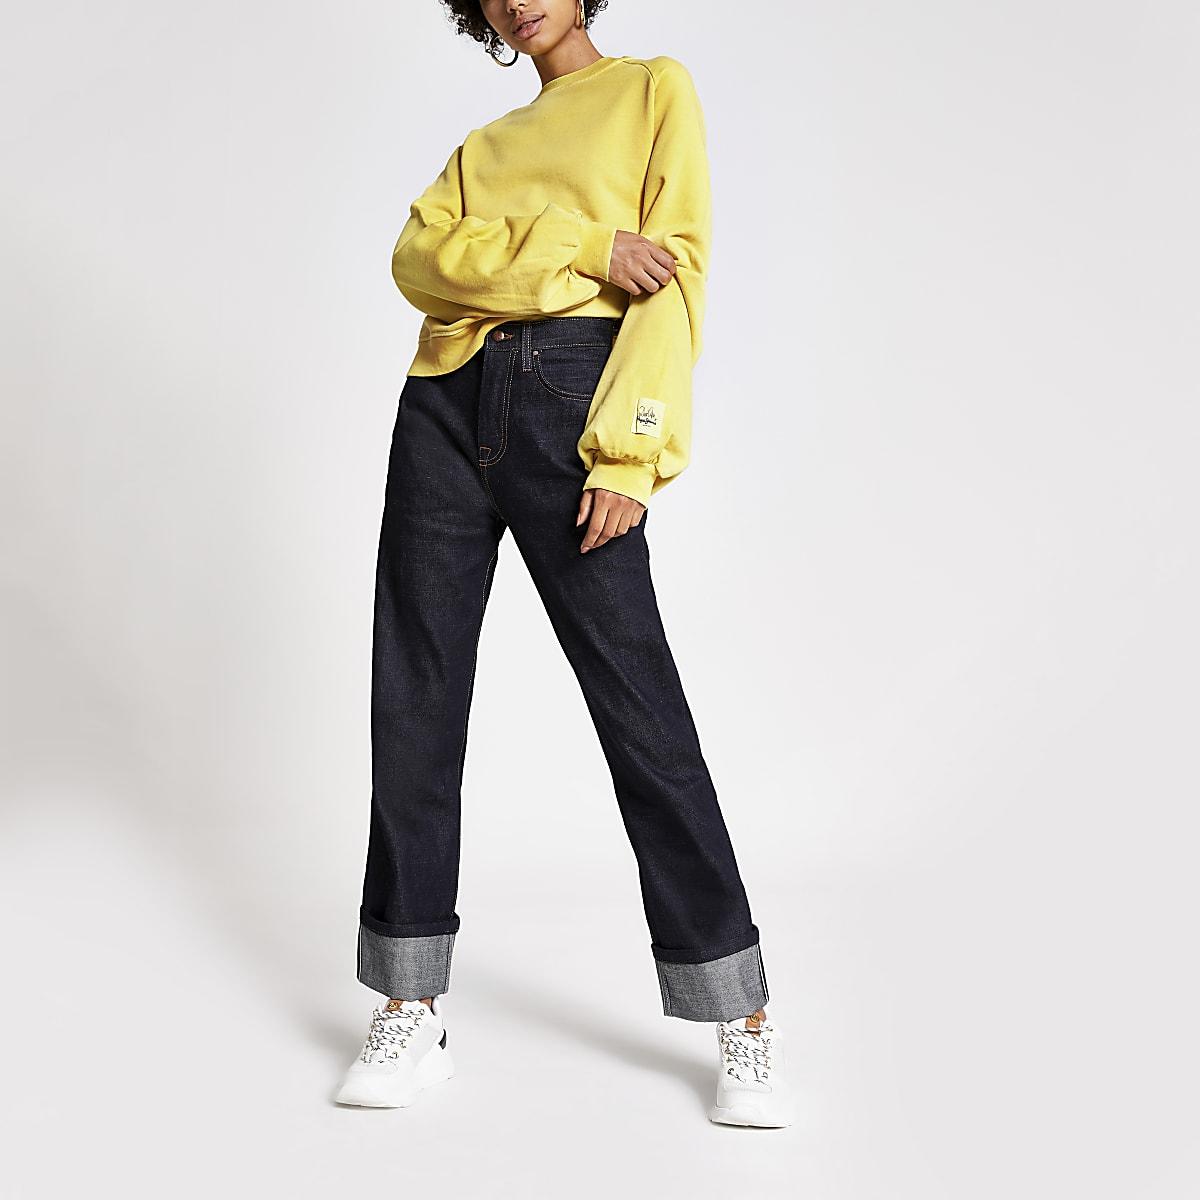 Dua Lipa x Pepe Jeans - Geel sweatshirt